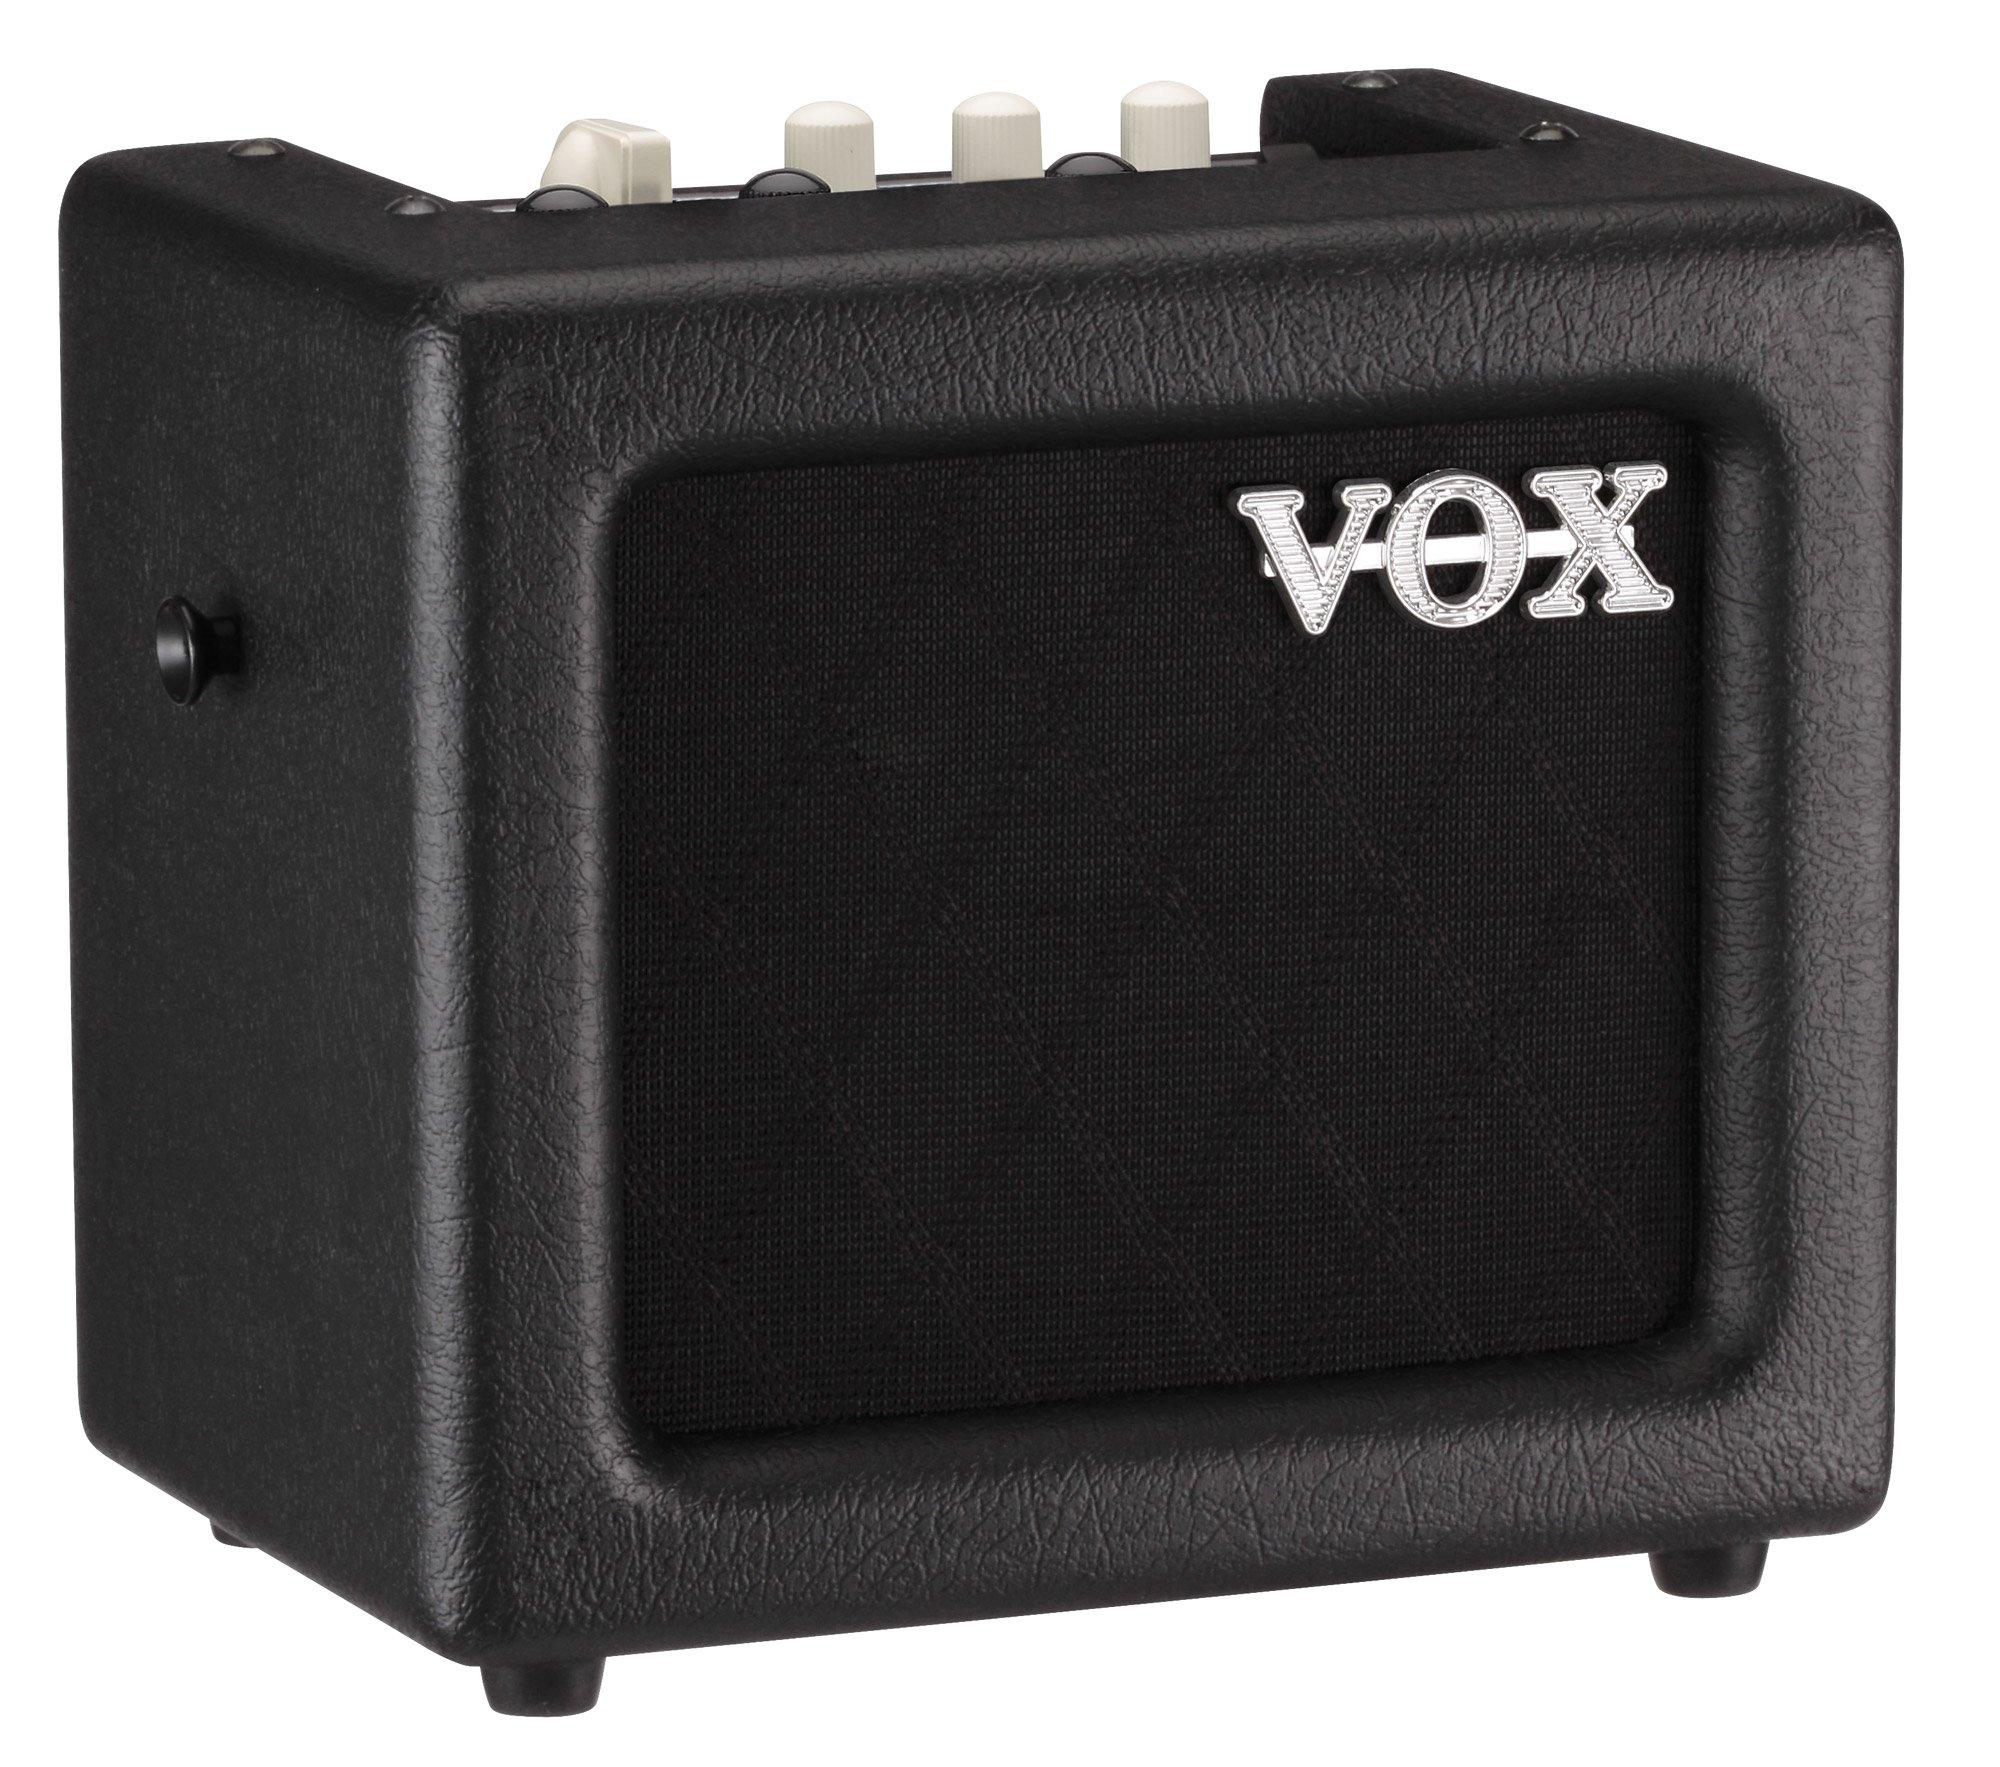 VOX Mini 3 G2 - Amplificador de guitarra, color negro: Amazon.es ...